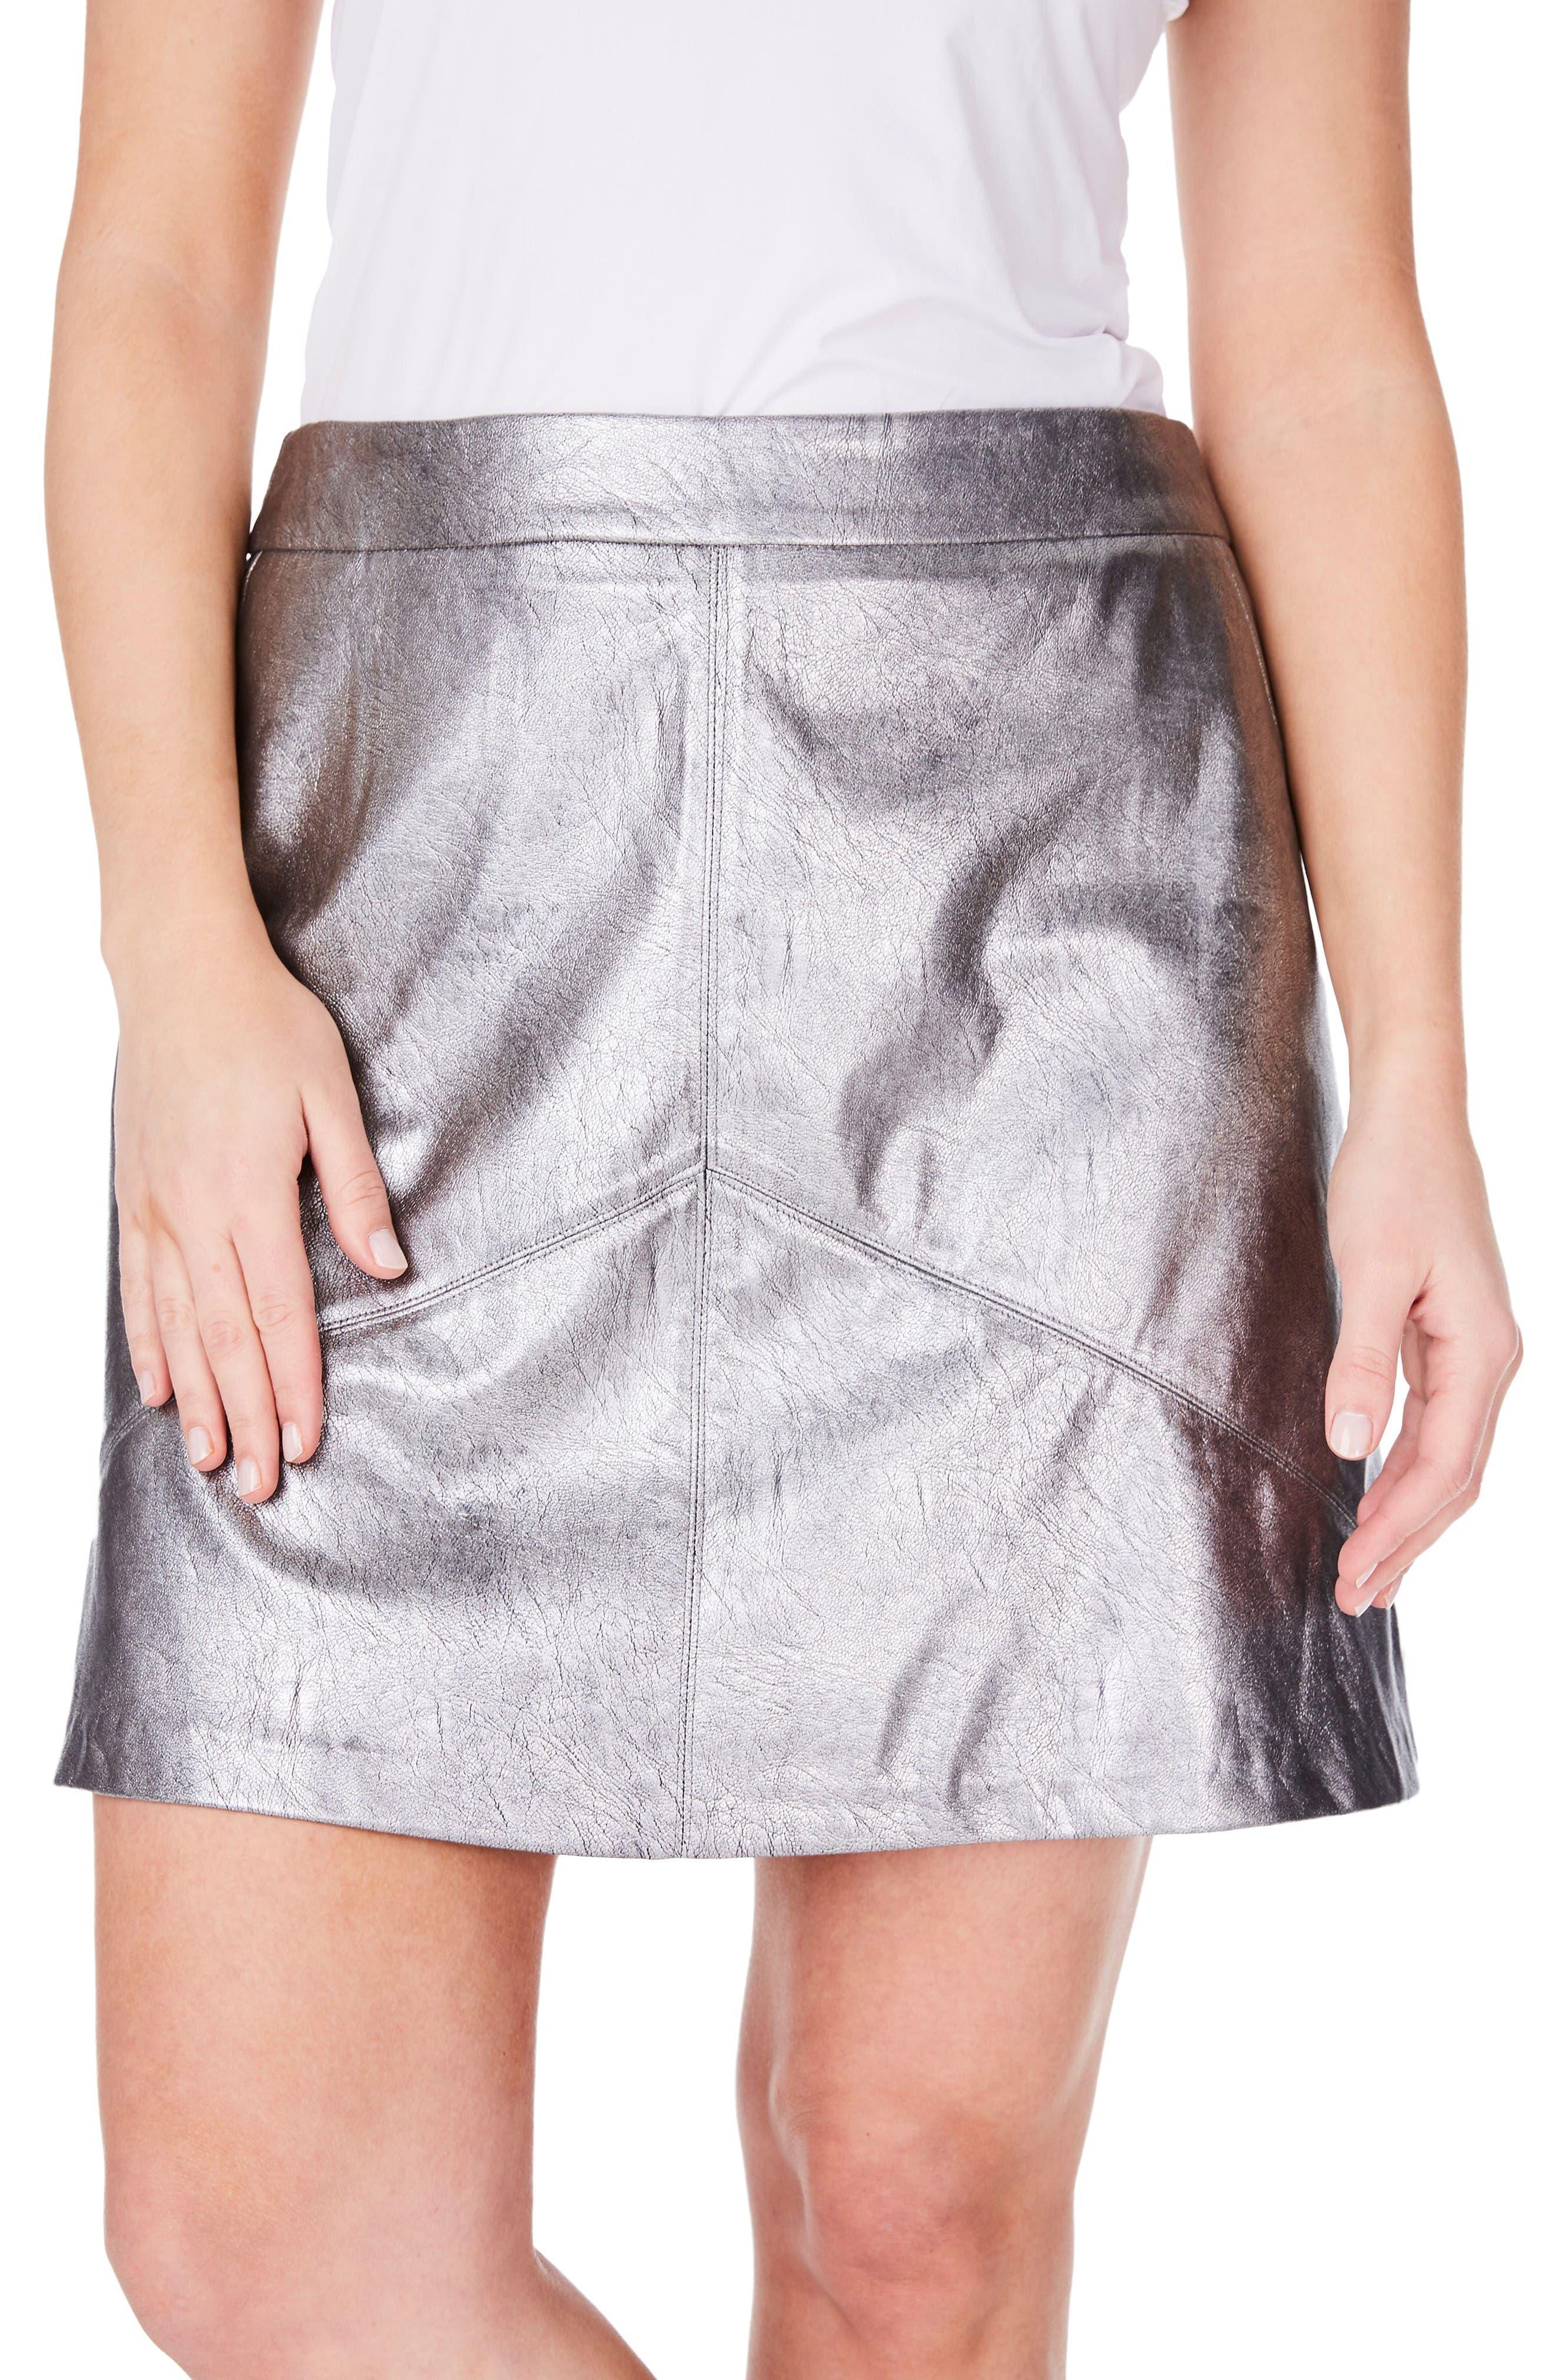 Alternate Image 1 Selected - ELVI Metallic Faux Leather Miniskirt (Plus Size)